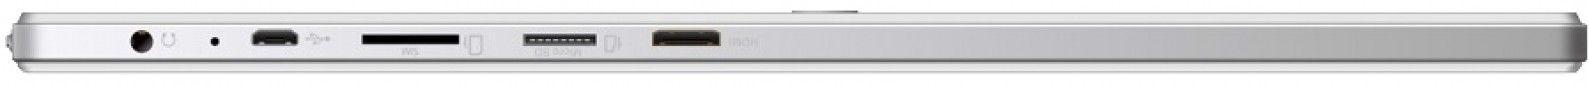 Планшет Prestigio MultiPad 4 Diamond 10.1 3G White (PMT7177_3G_D_WH) 3